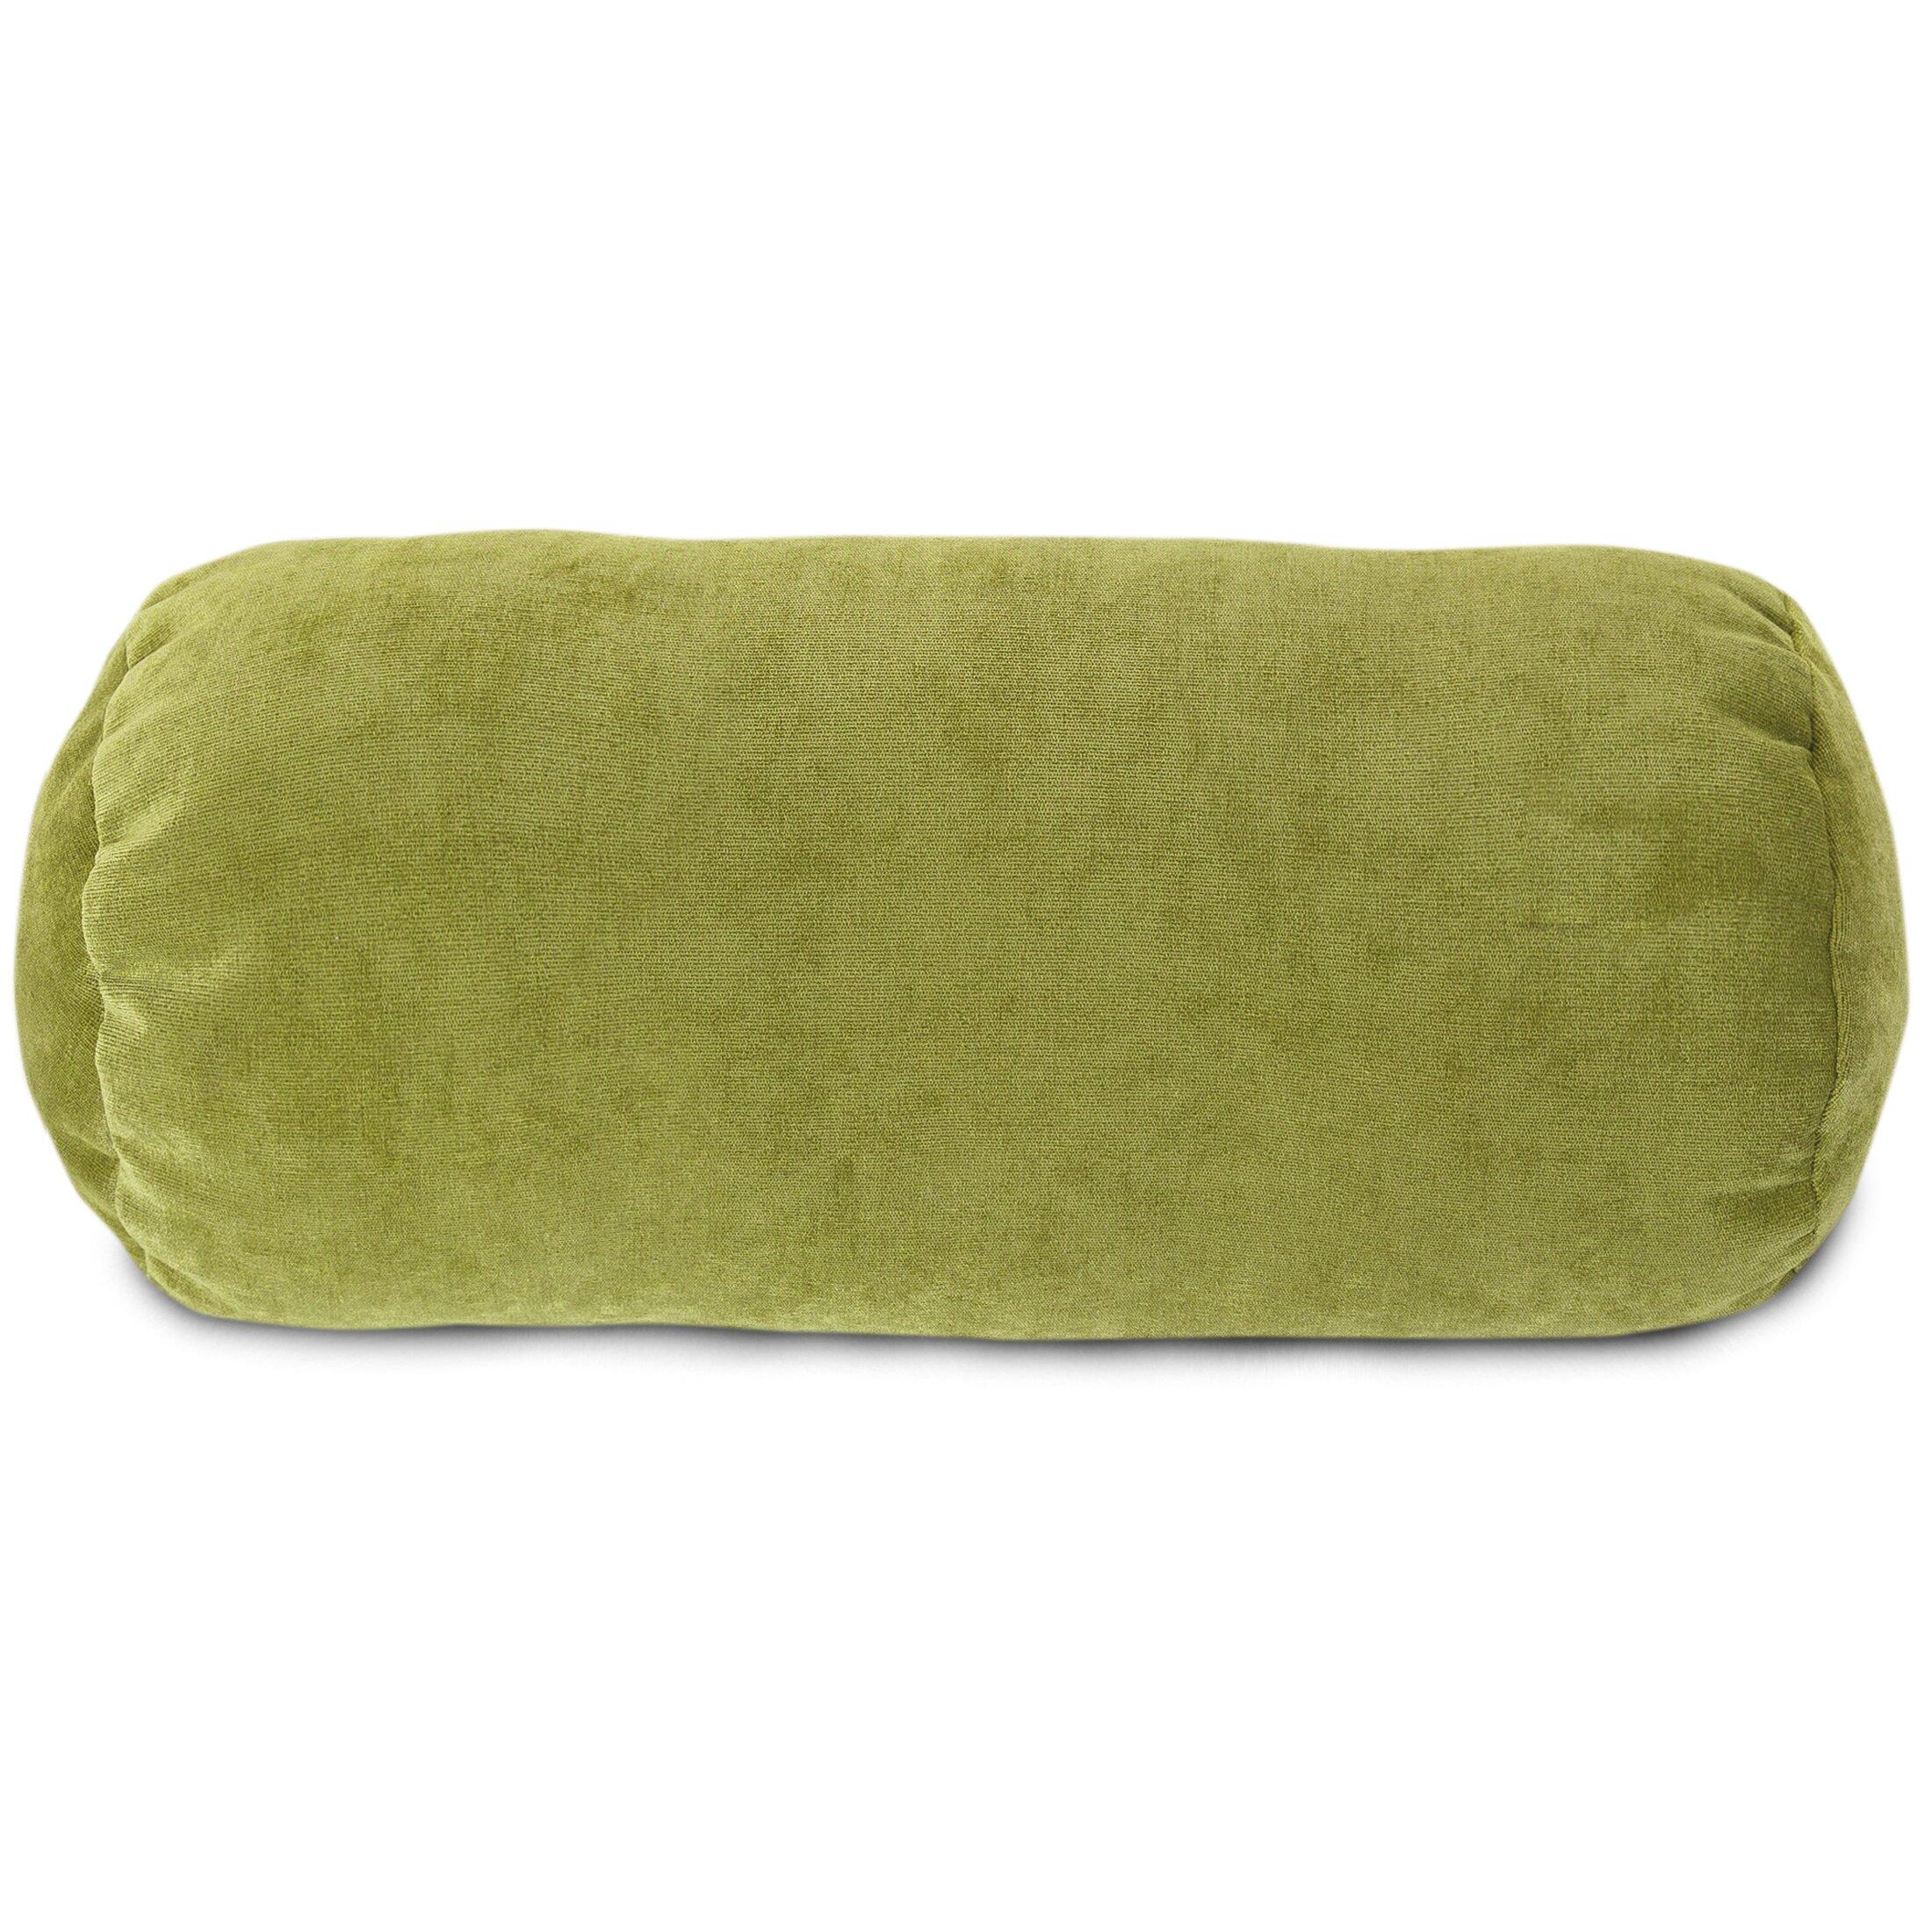 House of Hampton Bramma Polyester/Polyester blend Round Bolster Pillow & Reviews Wayfair